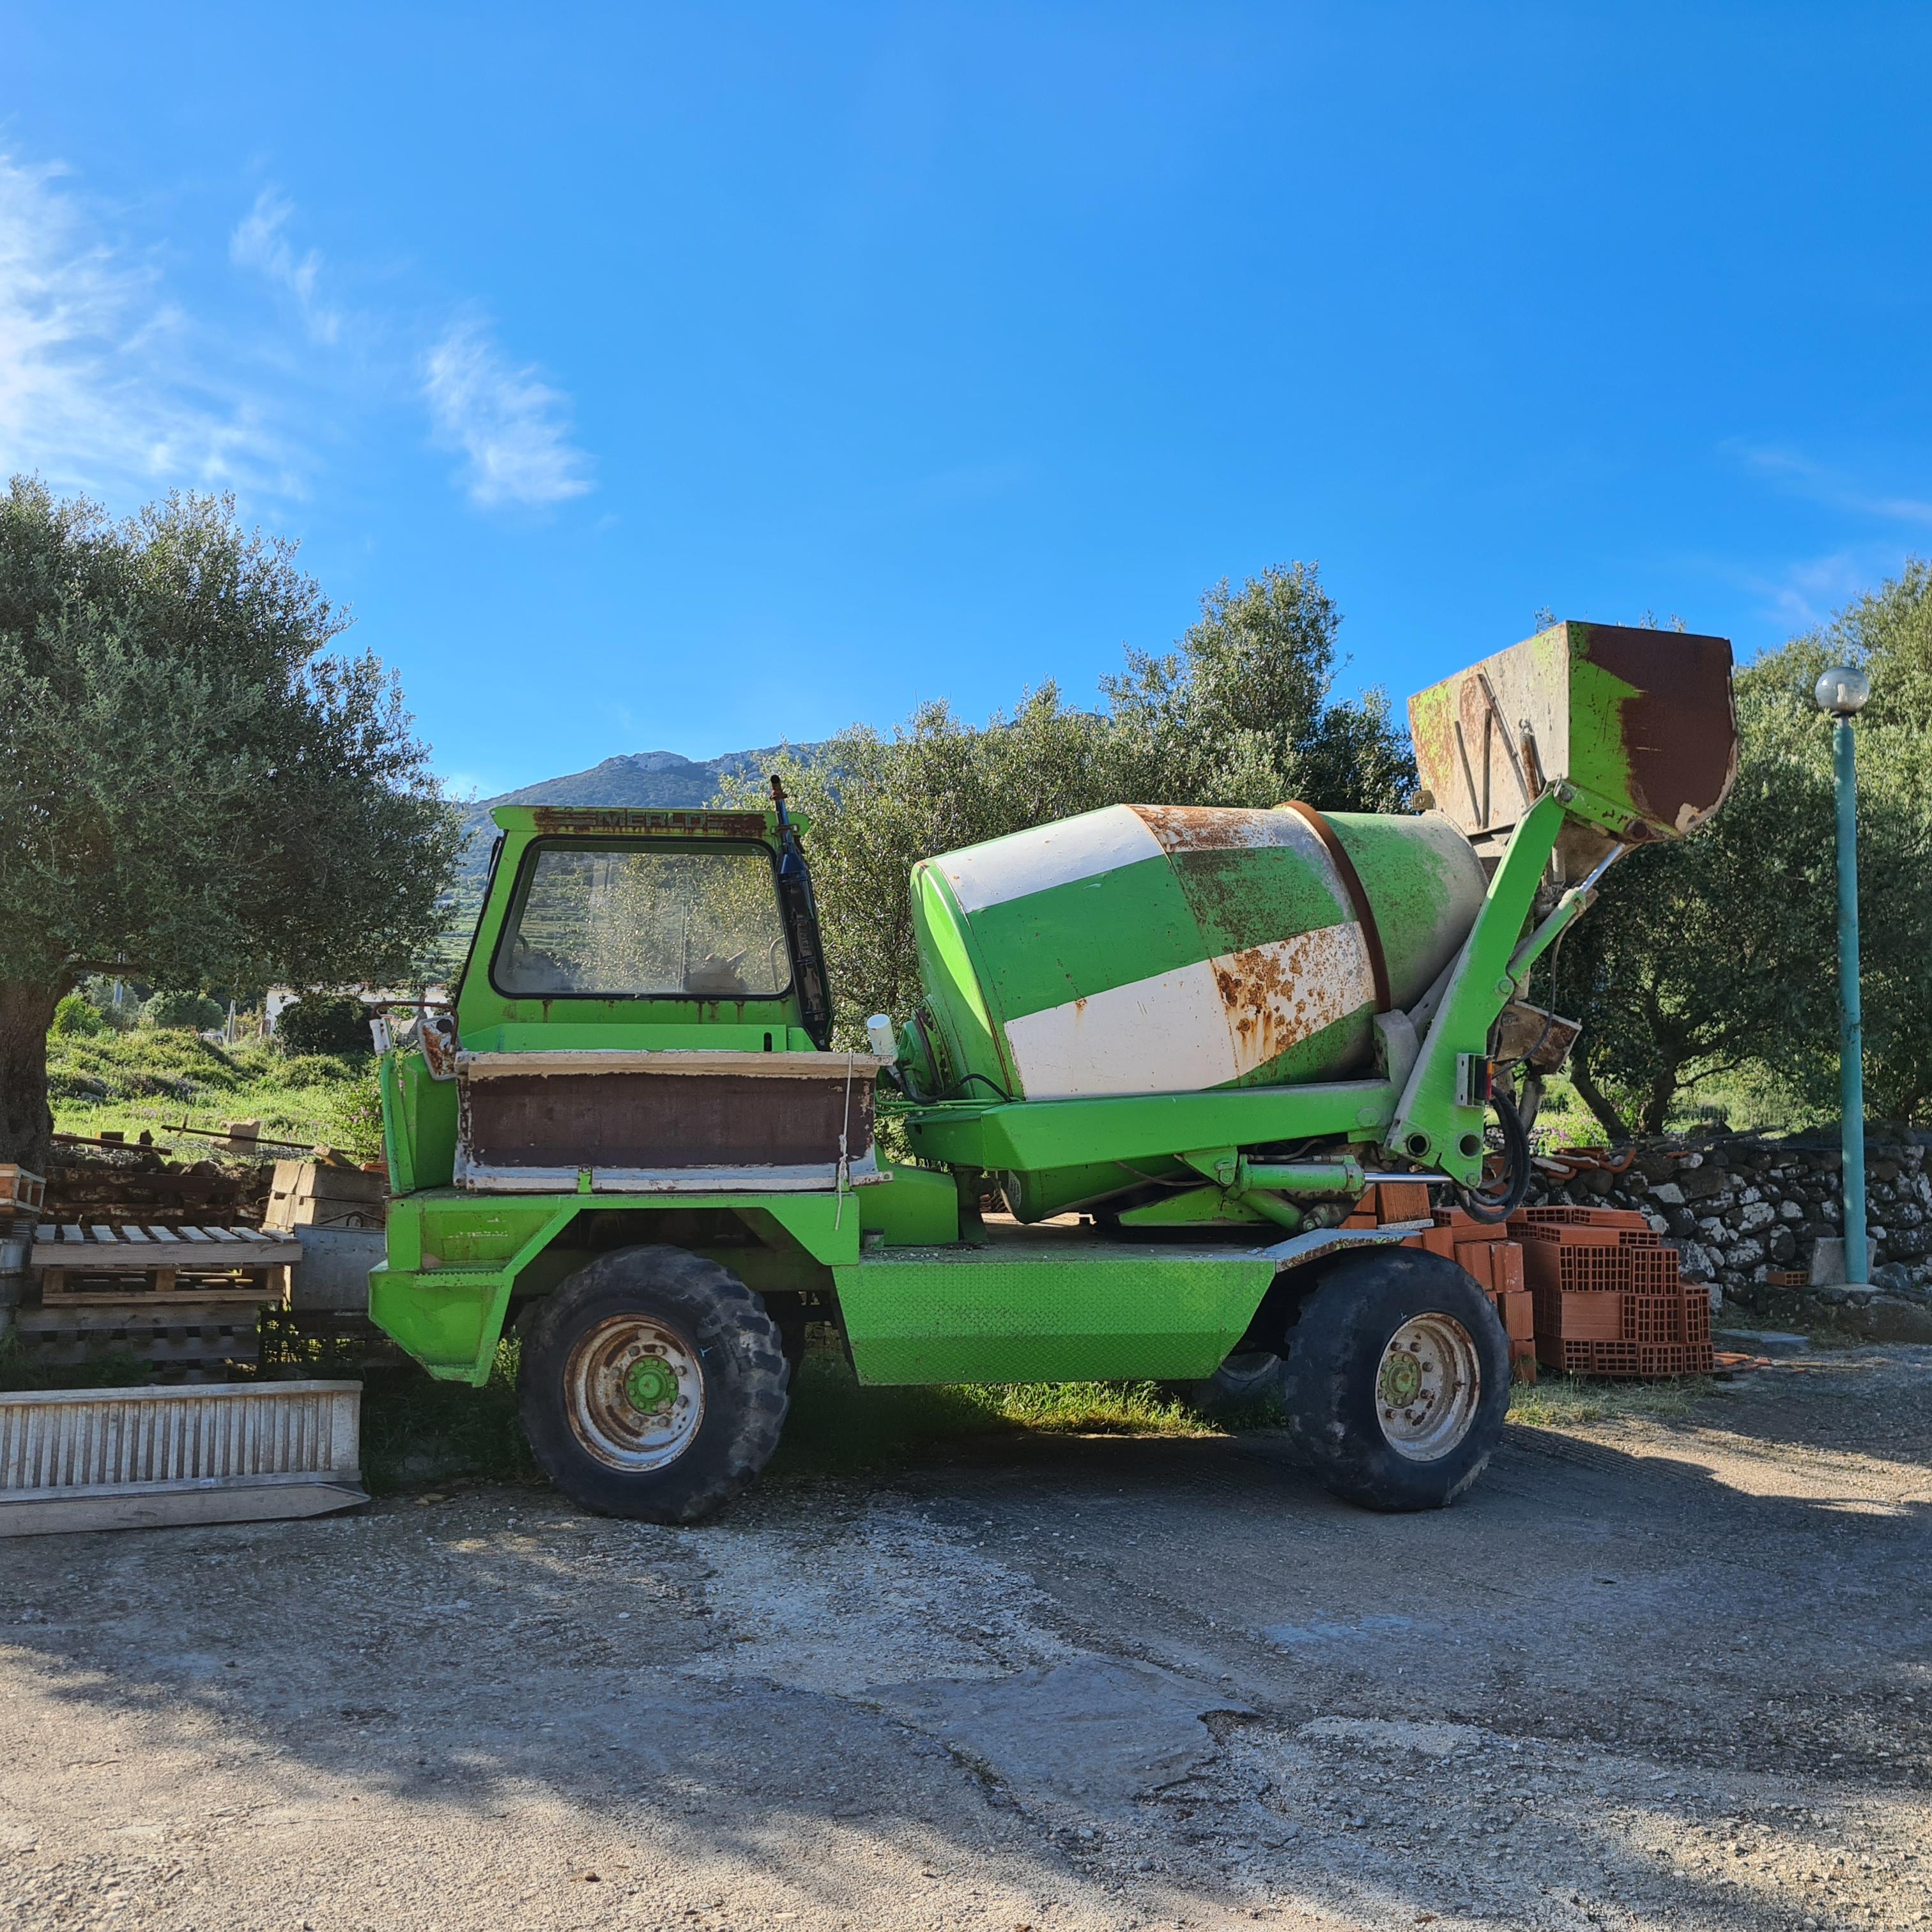 Merlo dumper betoniera dbm 2500 in vendita - foto 6